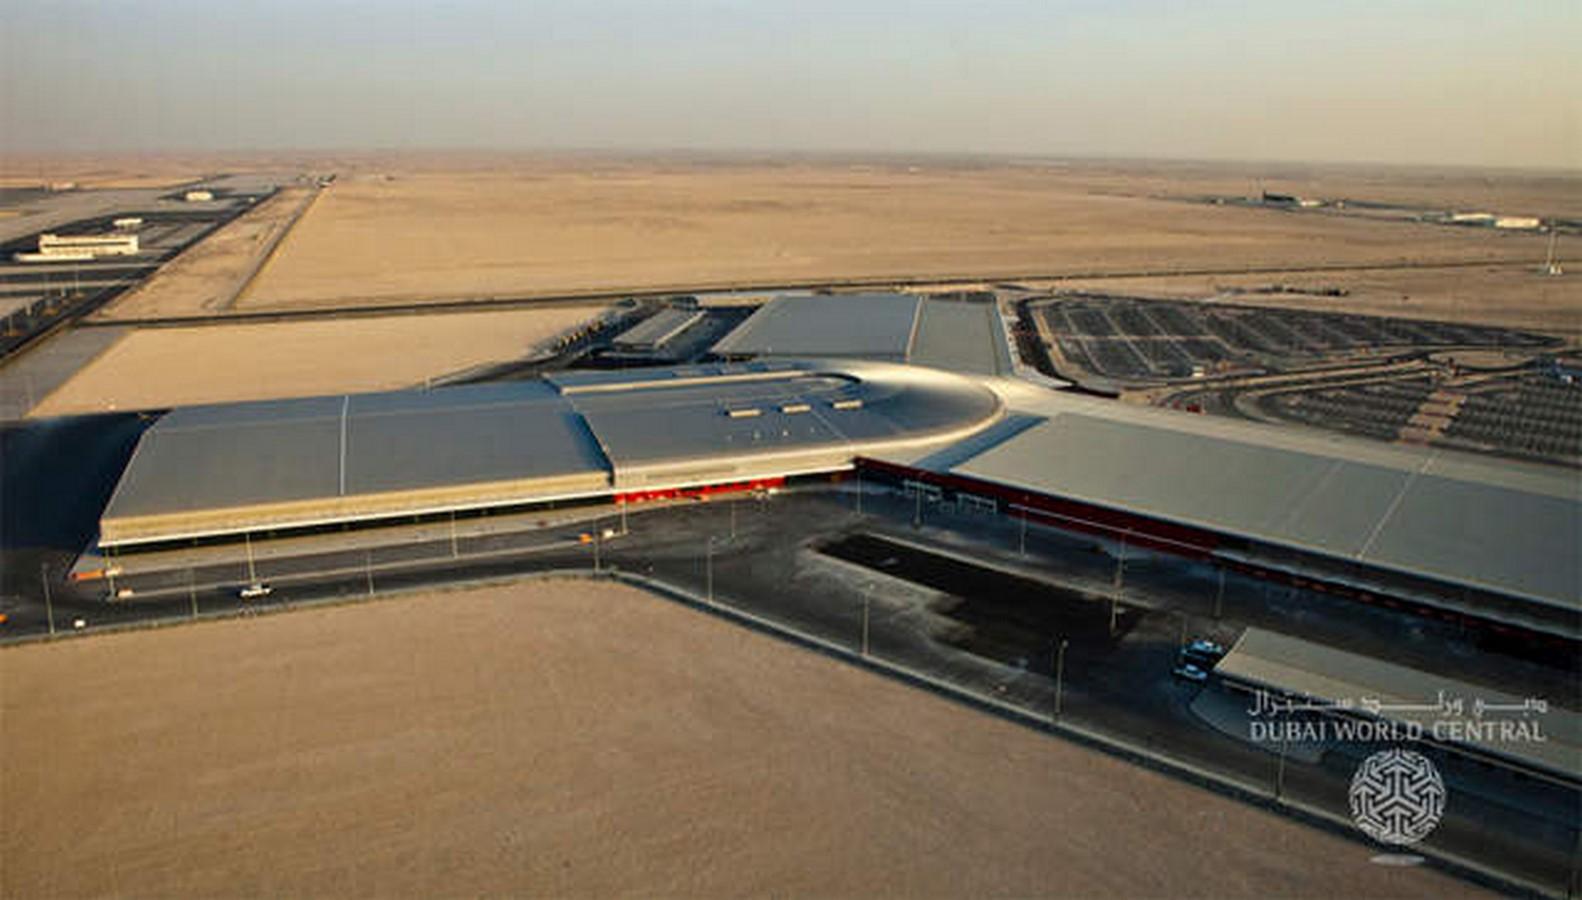 Al Maktoum International Airport, Dubai: World's first purpose-built aerotropolis - Sheet3